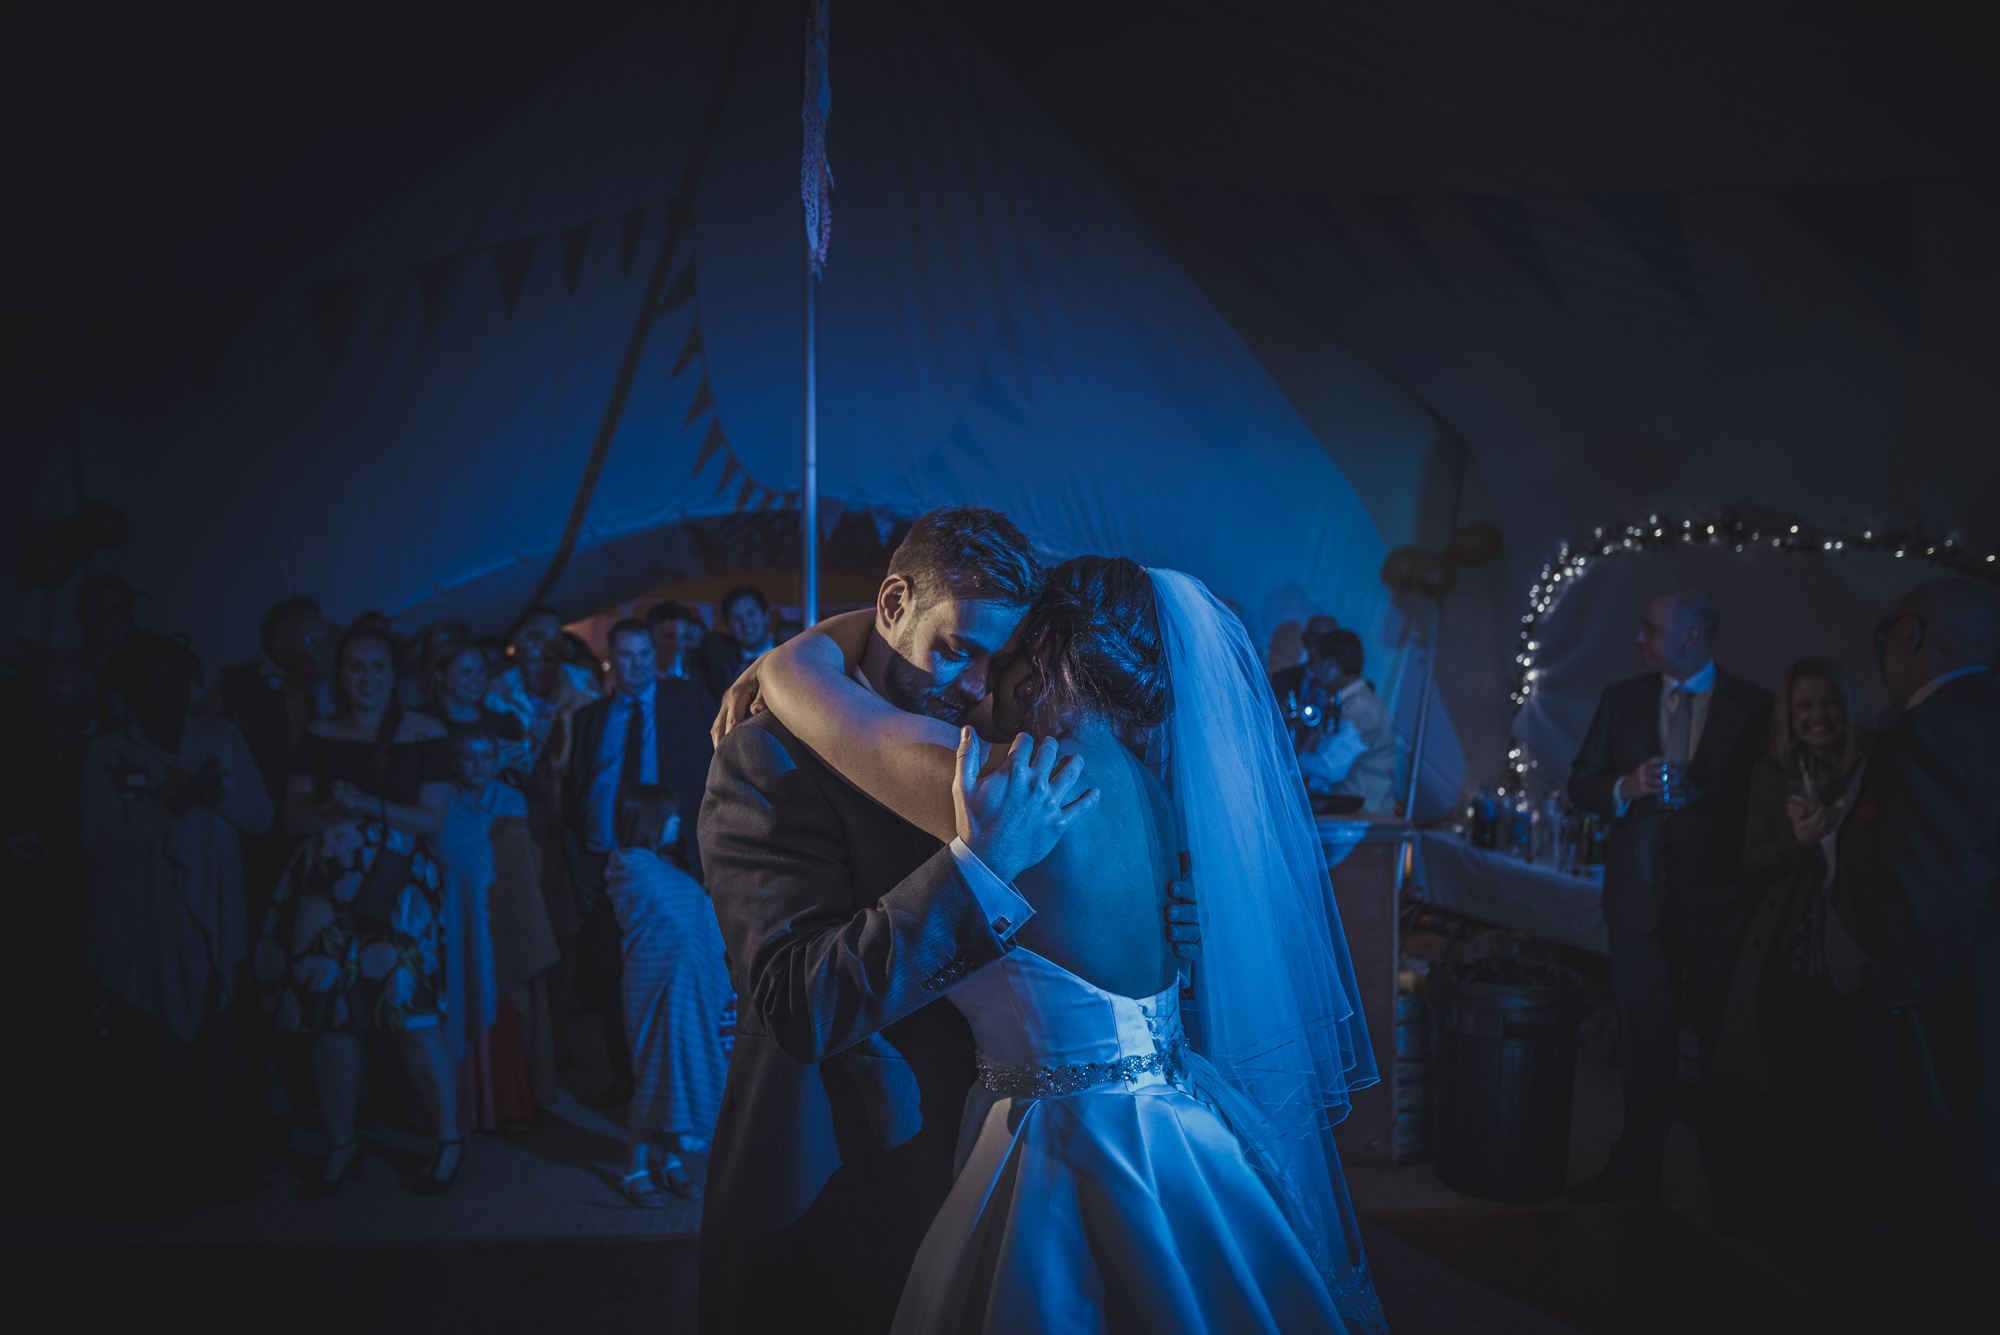 Jacqueline-Gareth-Wedding-Westmead-Events-Surrey-Manu-Mendoza-Wedding-Photography-519.jpg